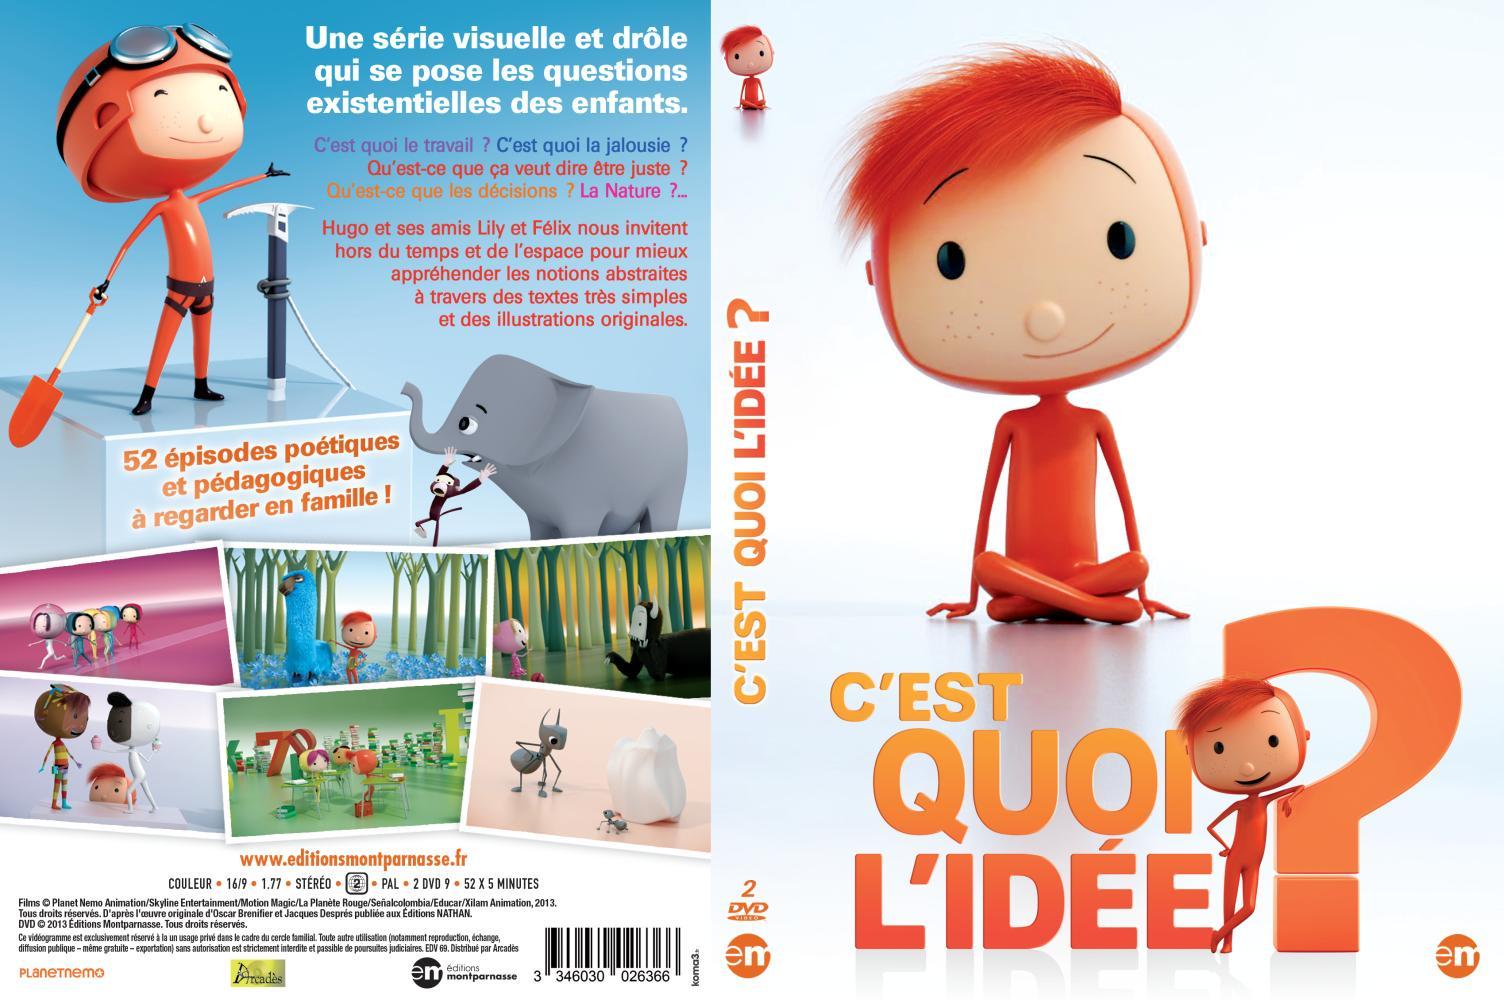 C Est Quoi L Idee Coffret 2 Dvd Editions Montparnasse La